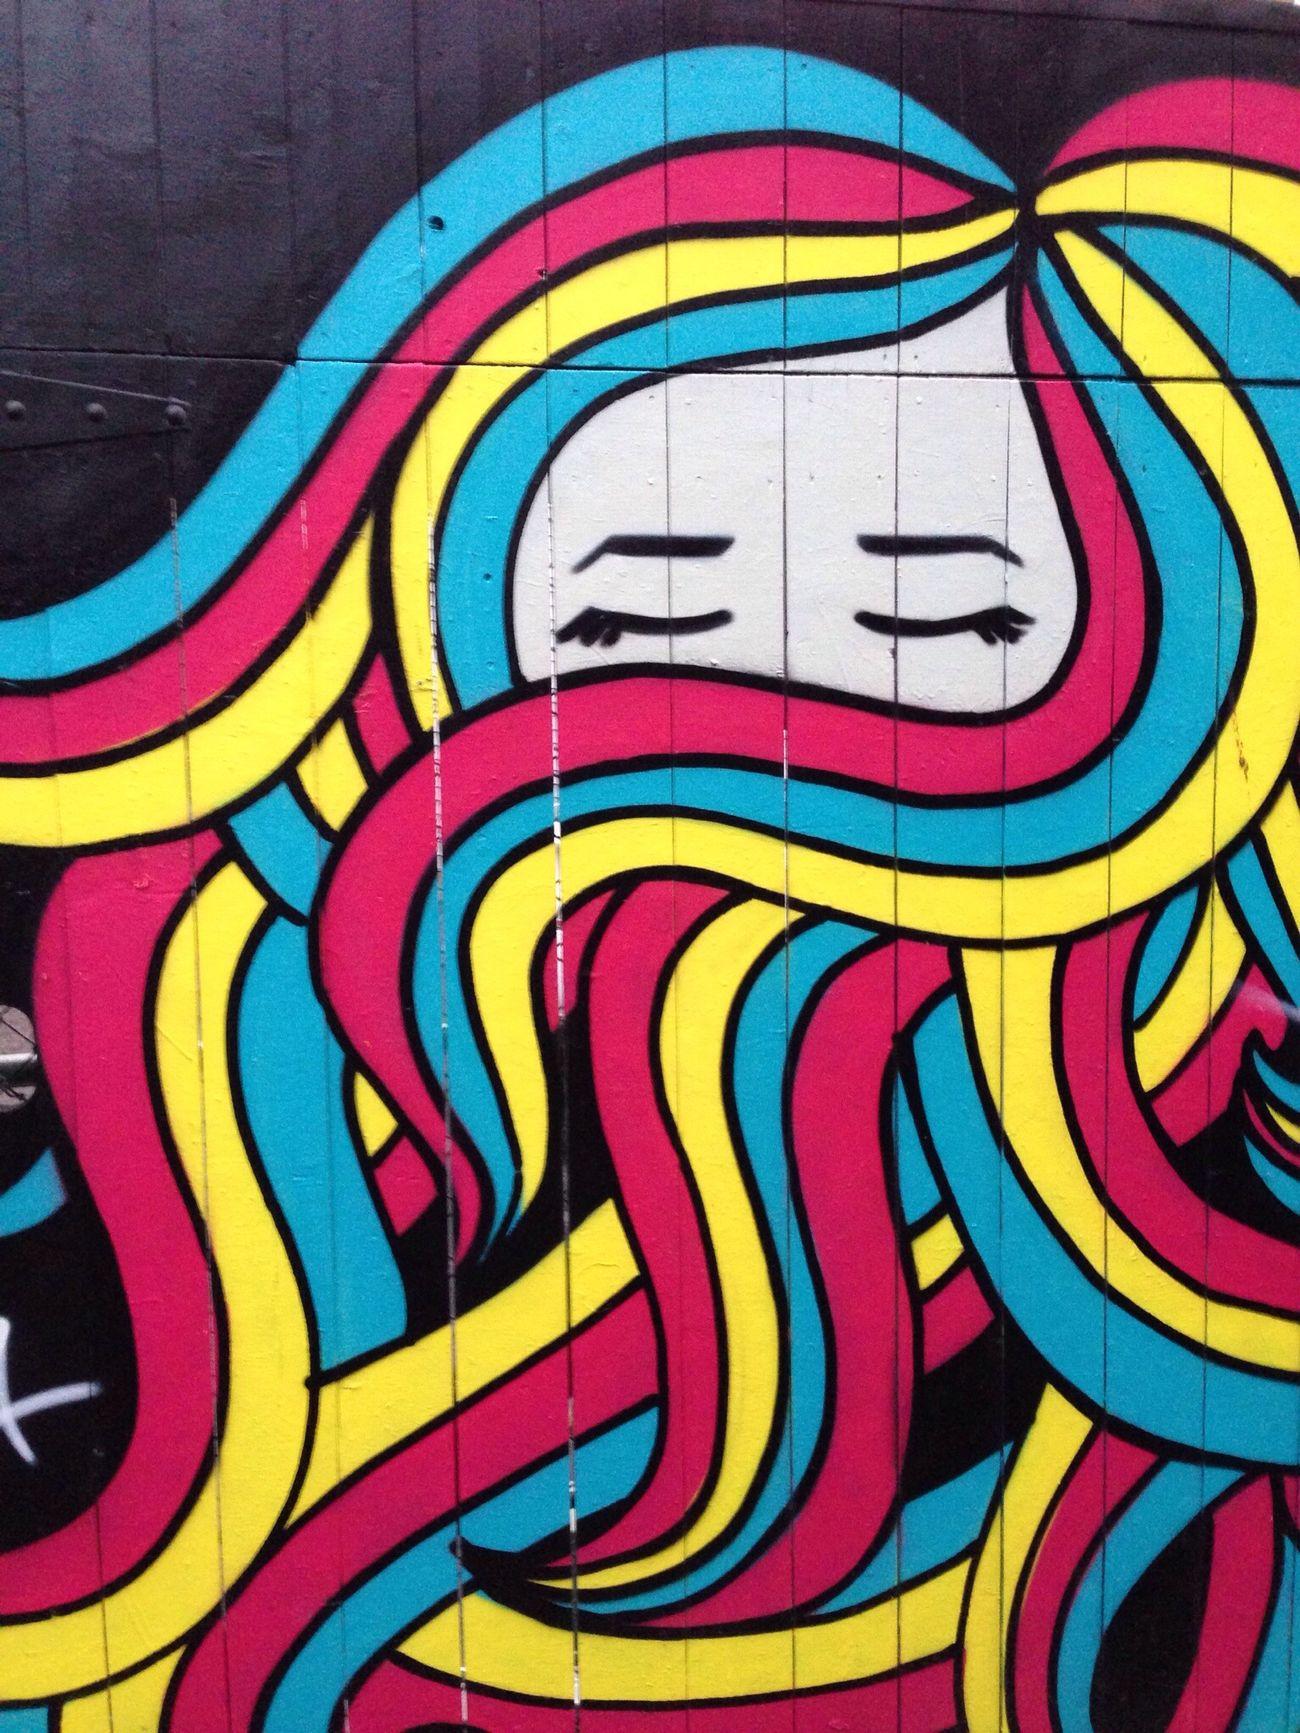 Streetart I See Faces Graffiti